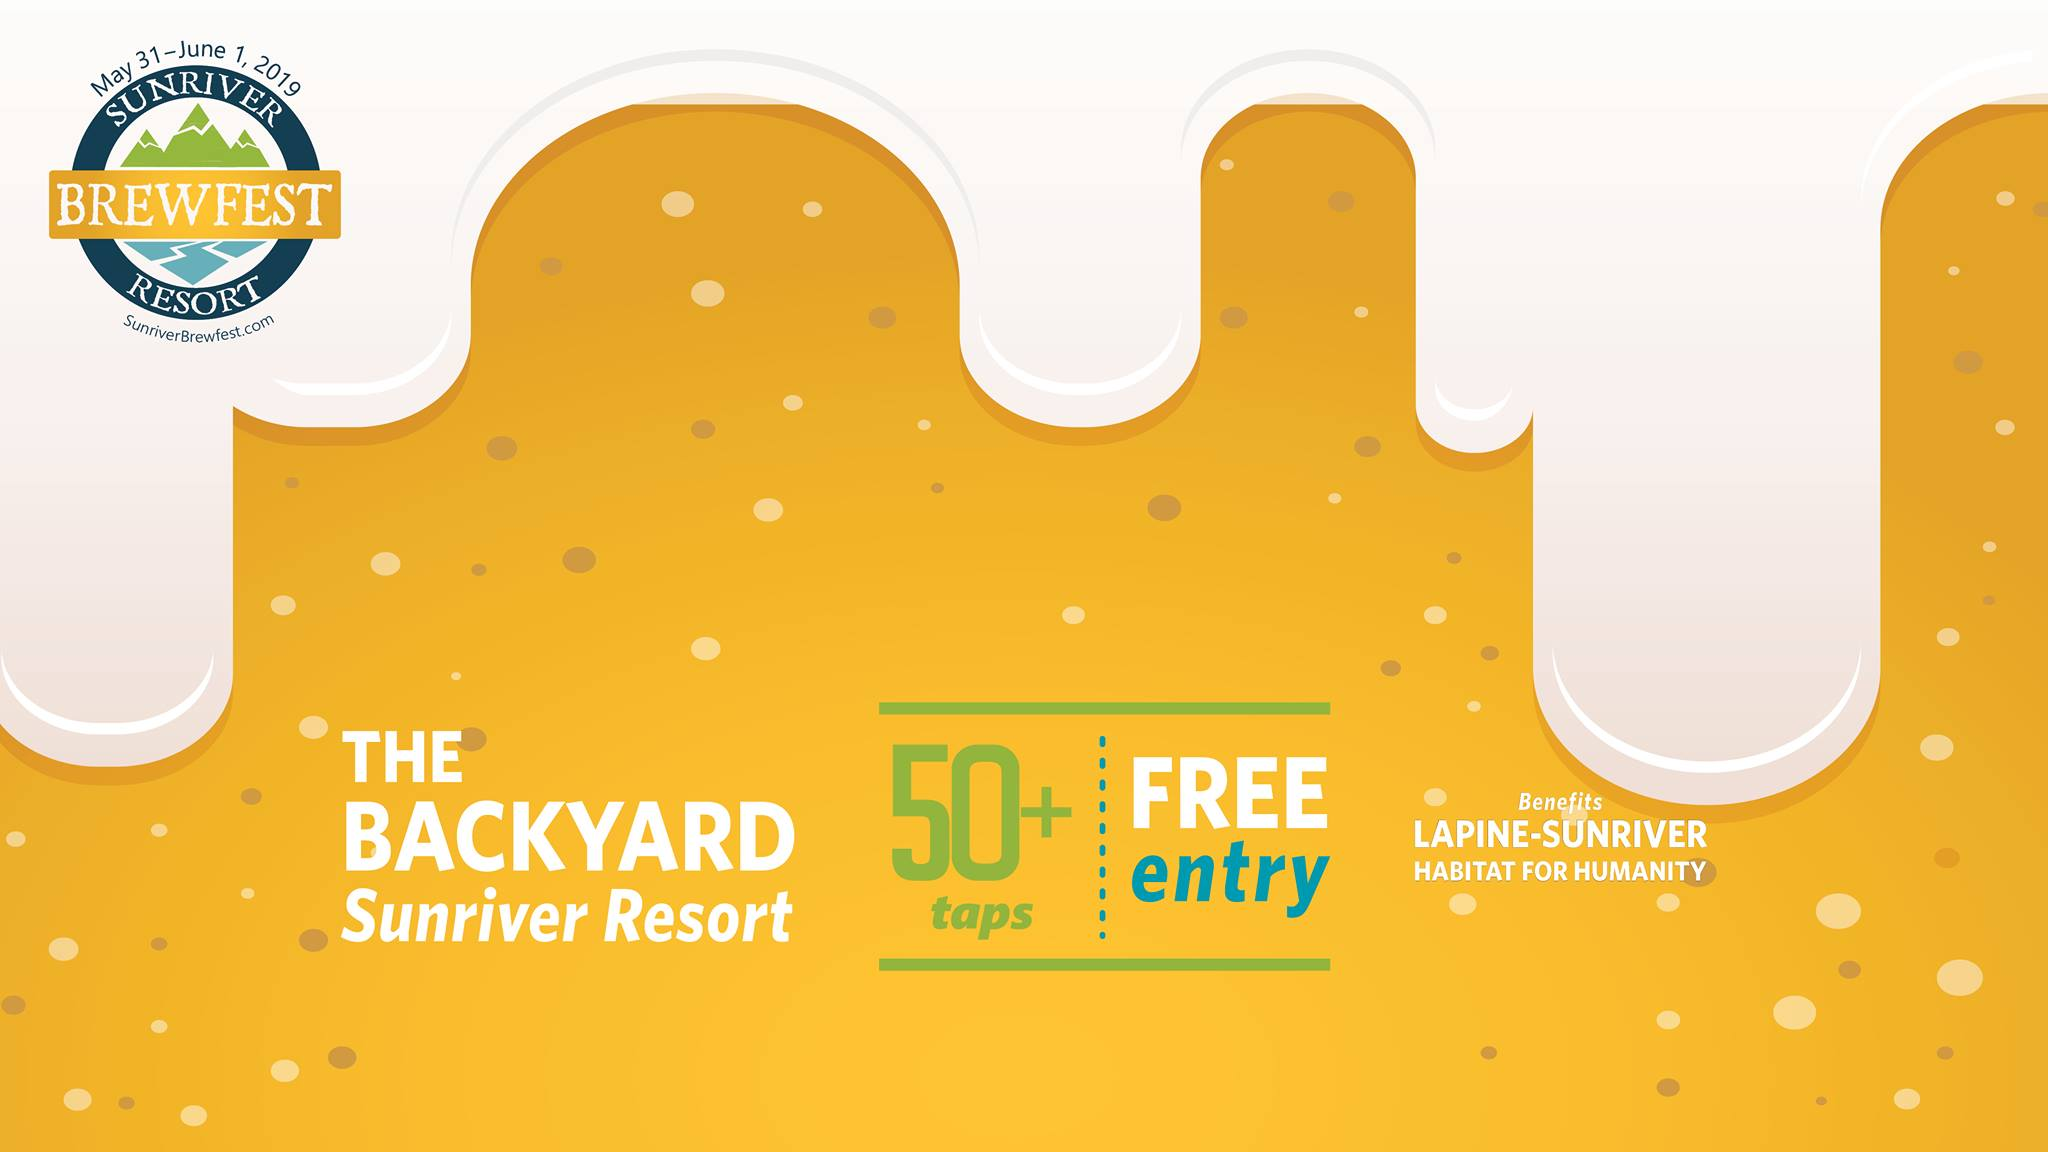 Sunriver Resort 2019 Brewfest